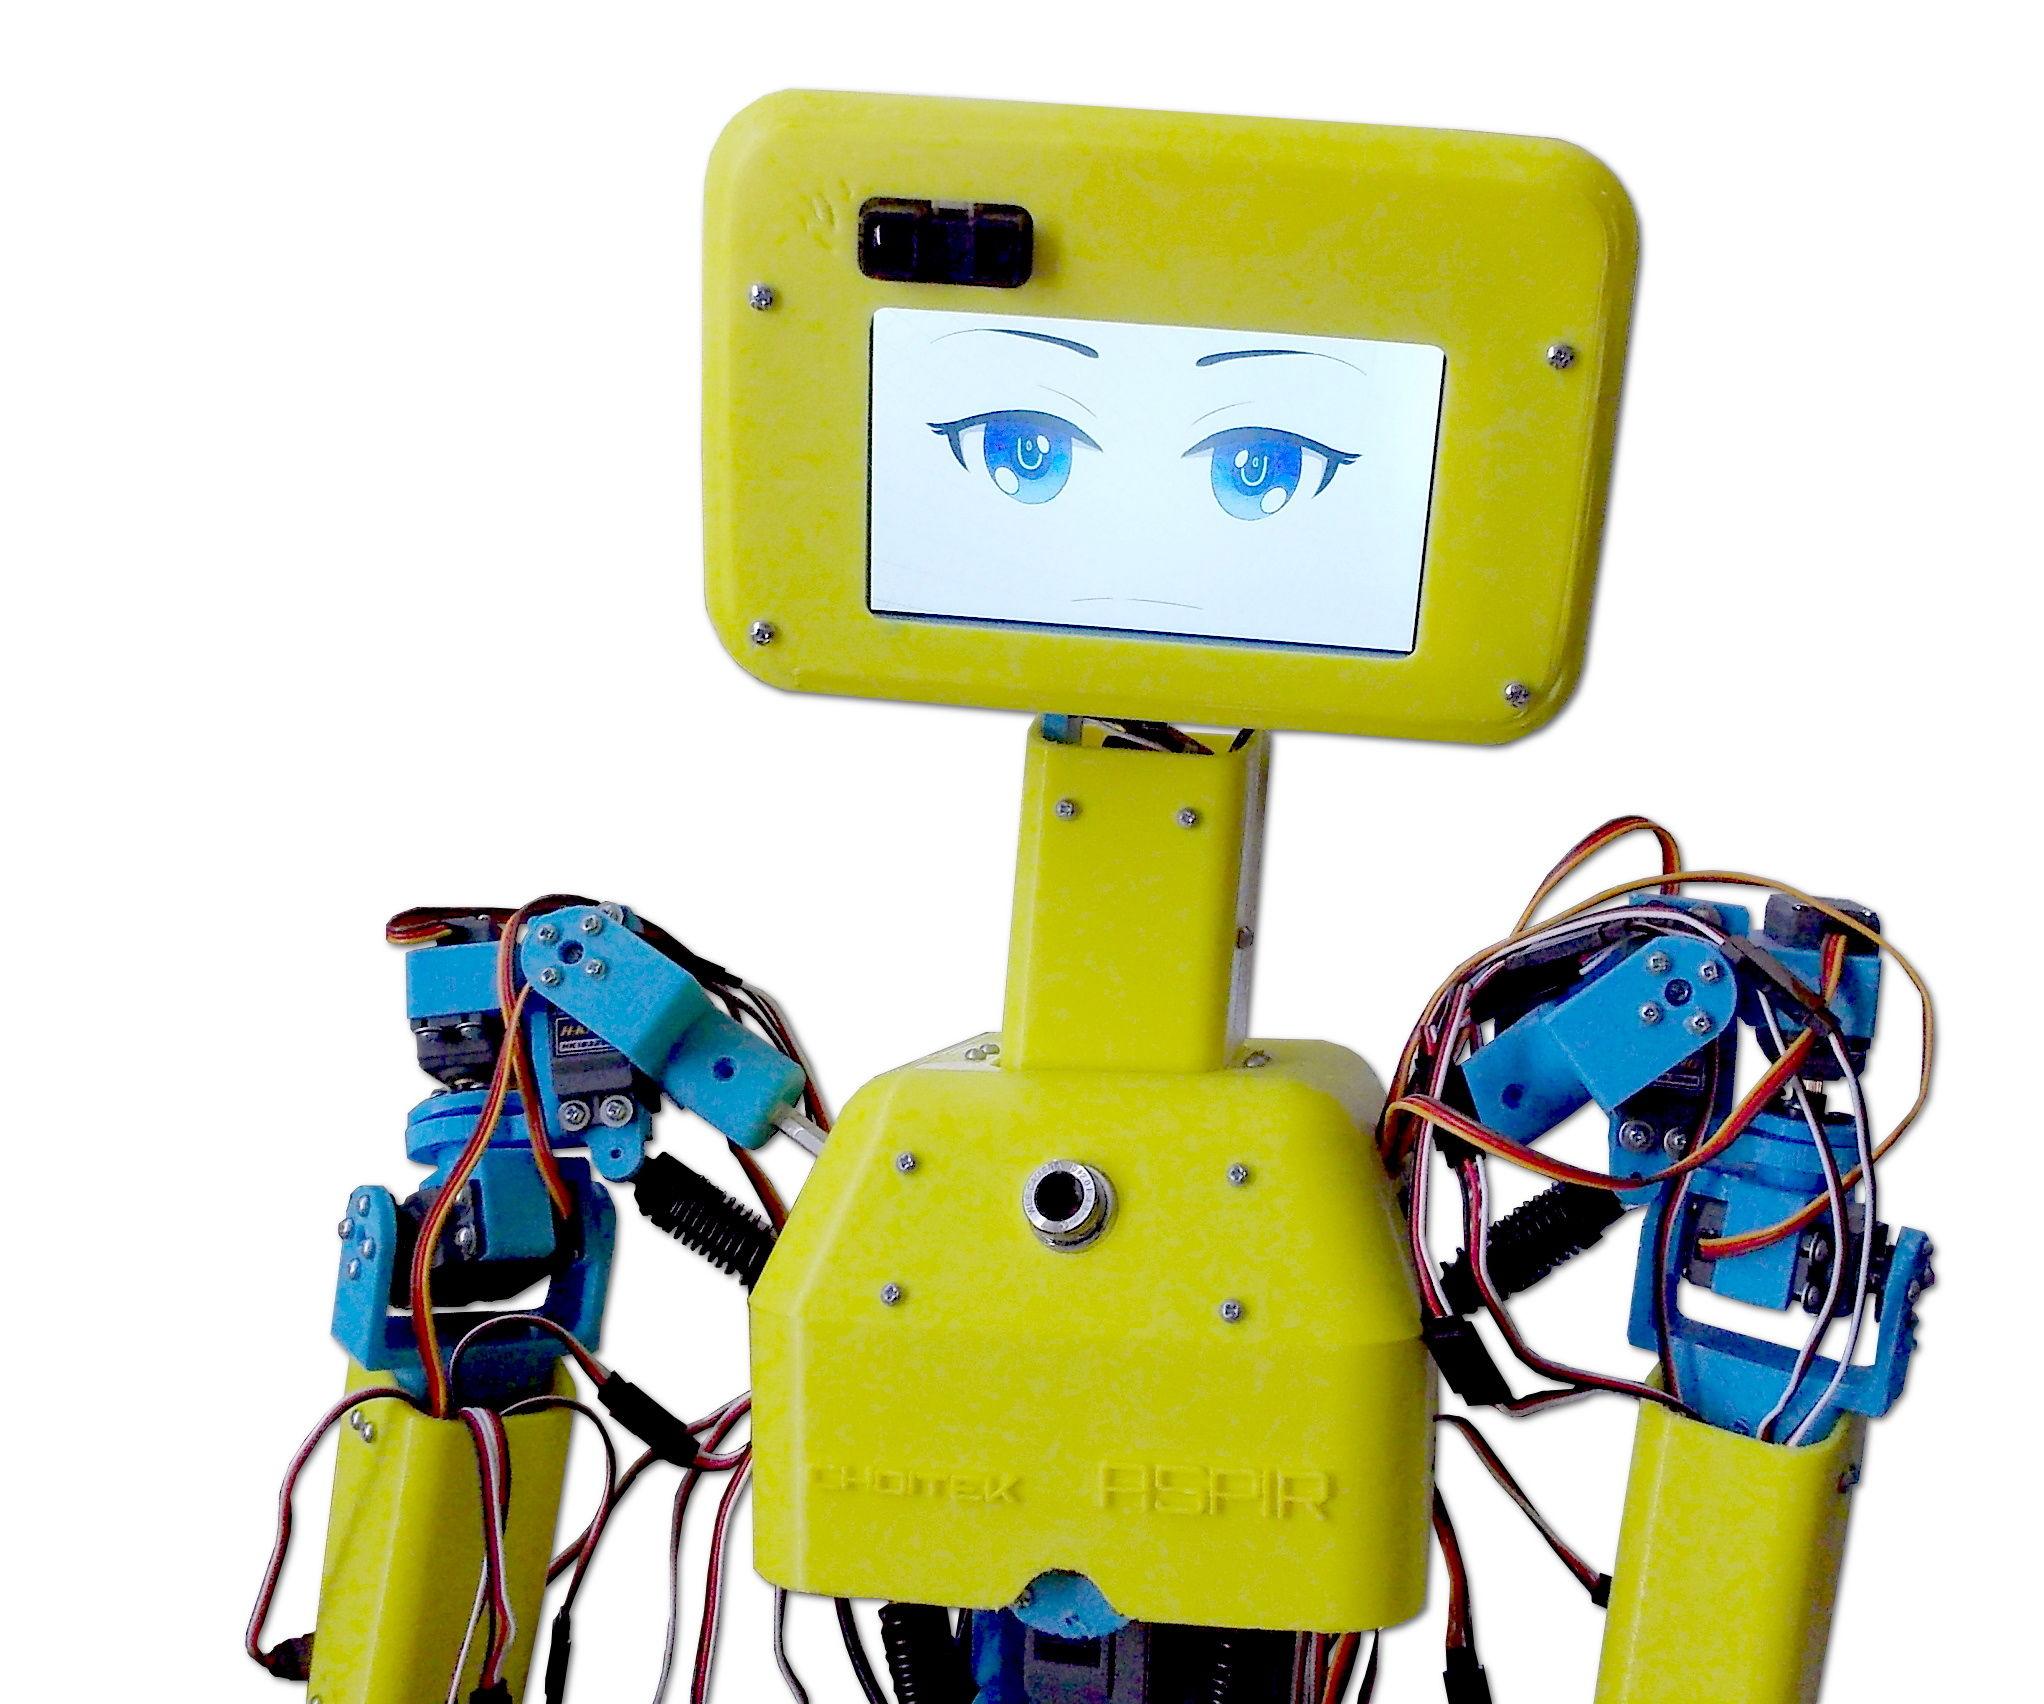 ASPIR: Full-Size 3D-Printed Humanoid Robot